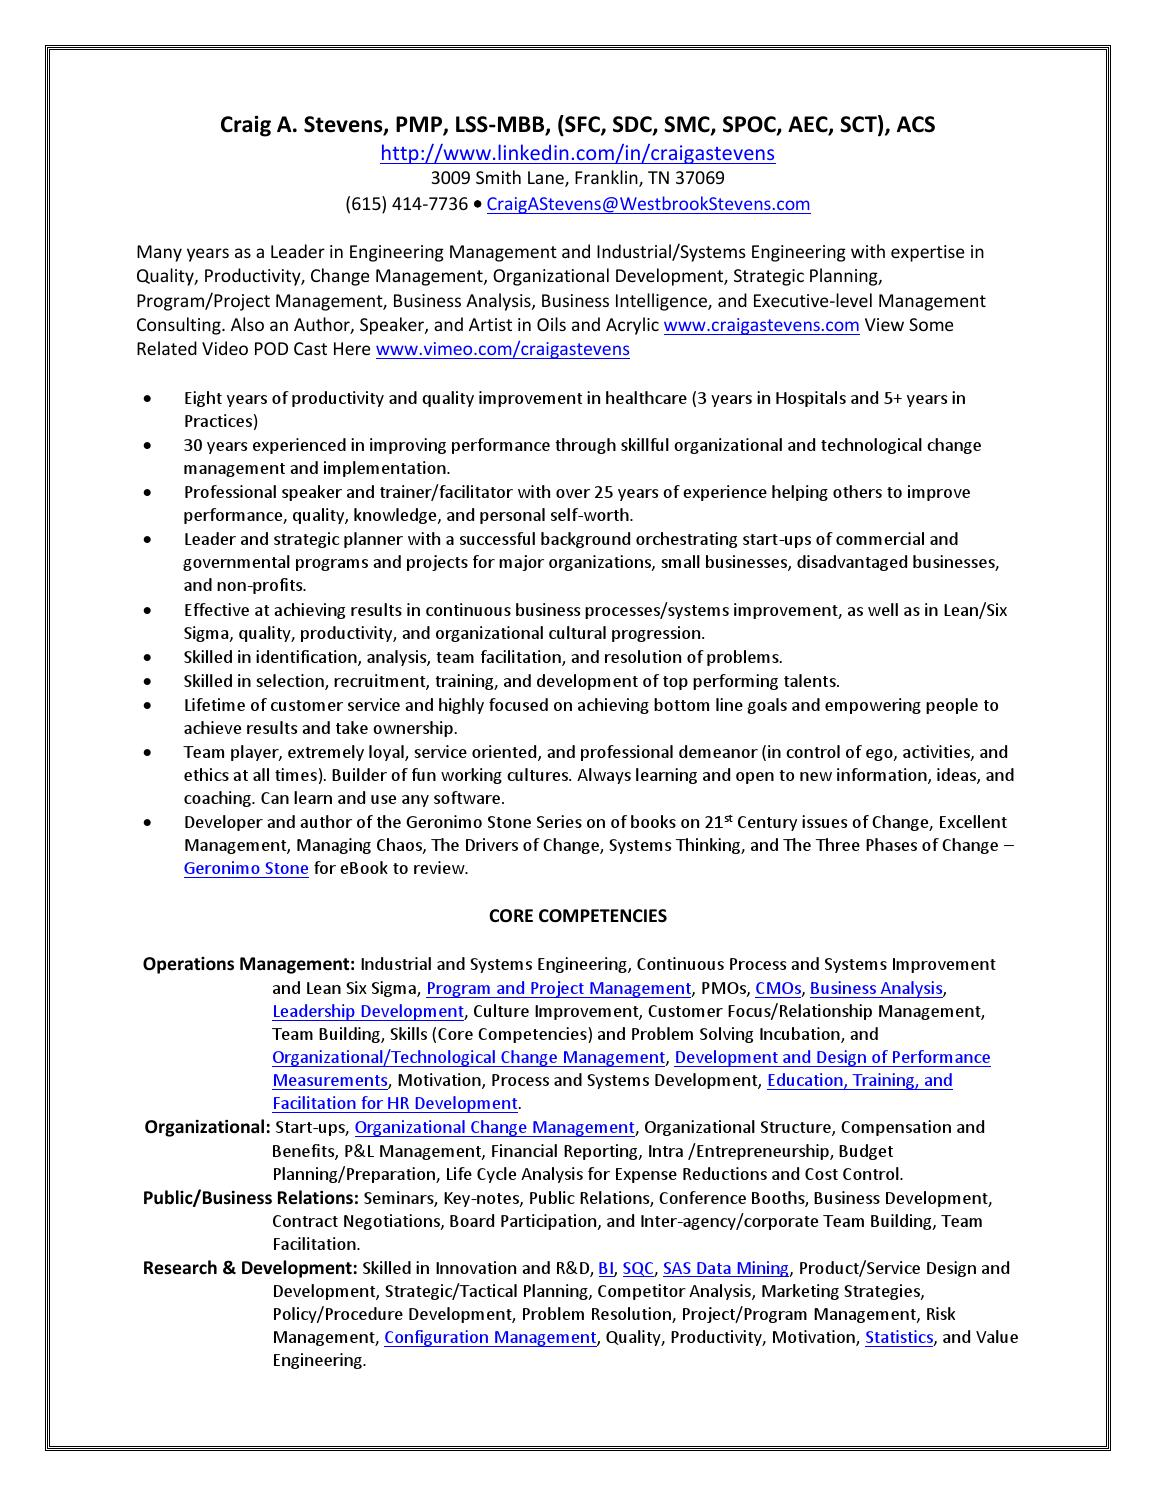 20151003 stevens complete resume by craig stevens